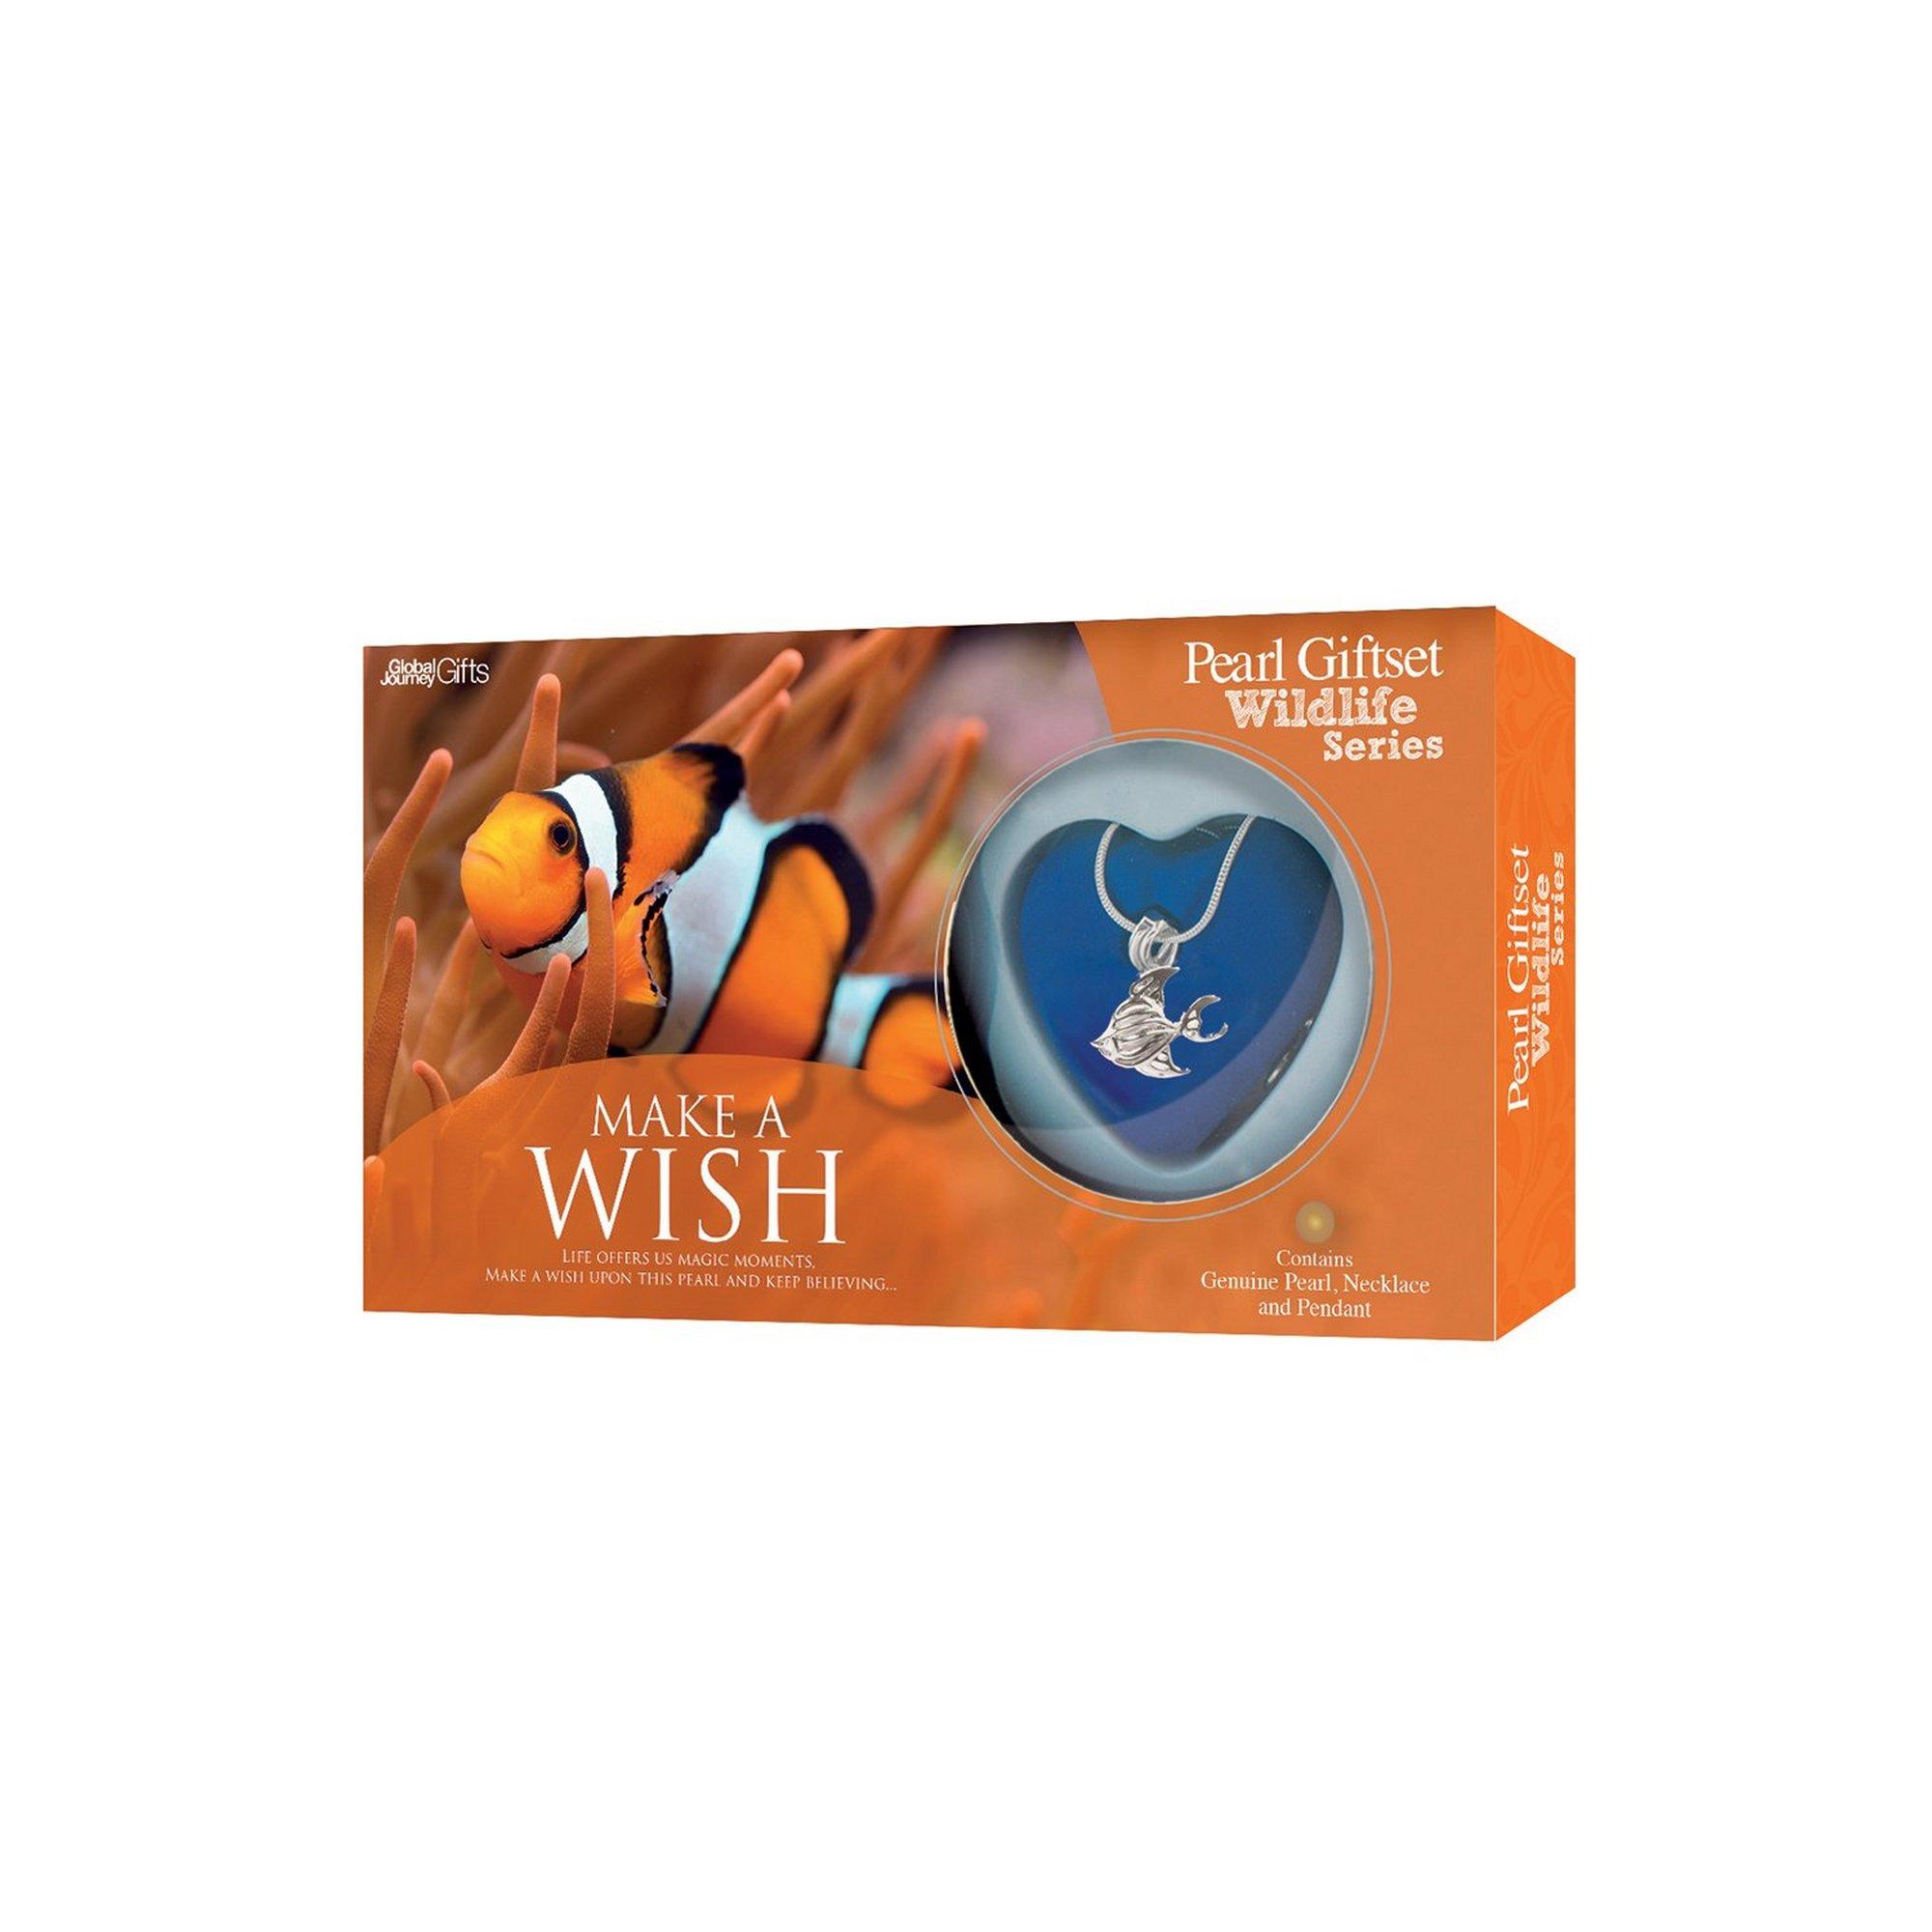 Image of Make A Wish Clown Fish Pearl Pendant Gift Set